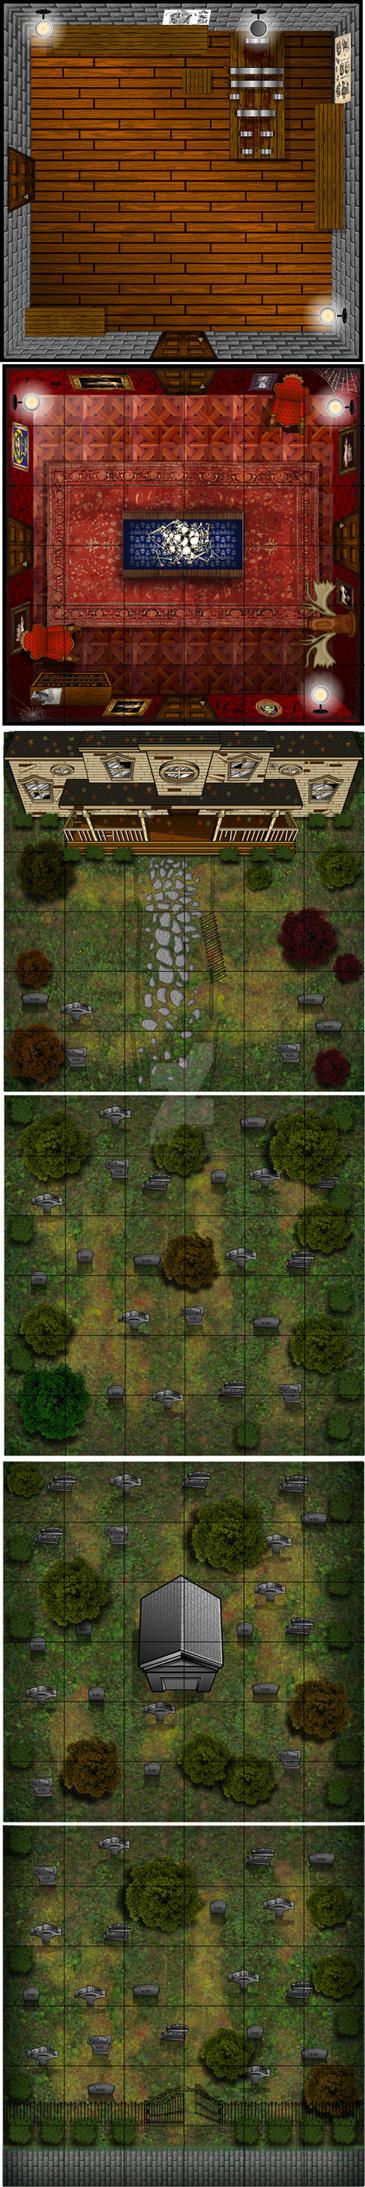 Tombstones and ScaryBones by godzillasmash